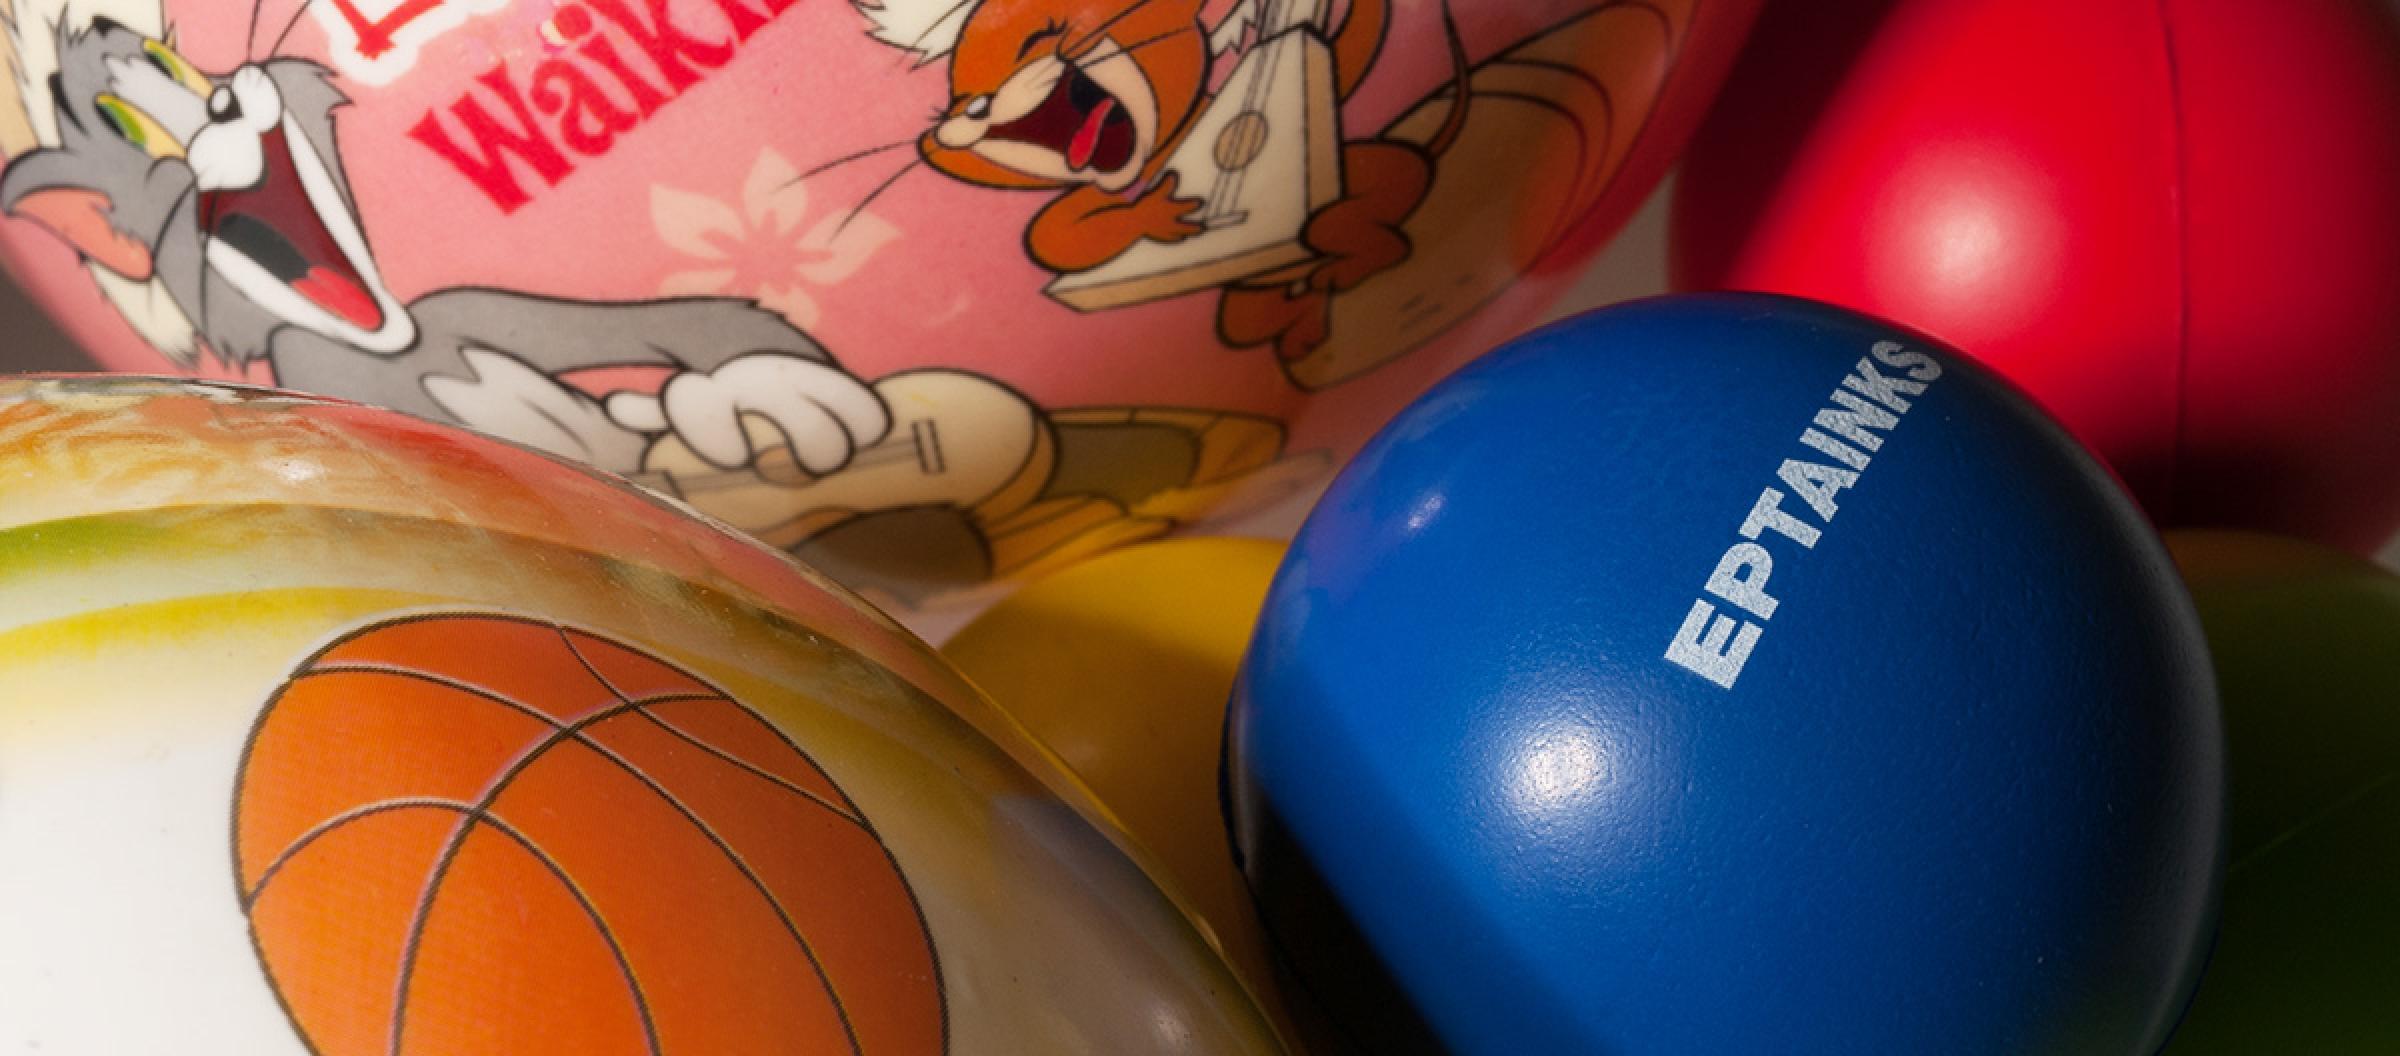 Leisure Palloni e palle